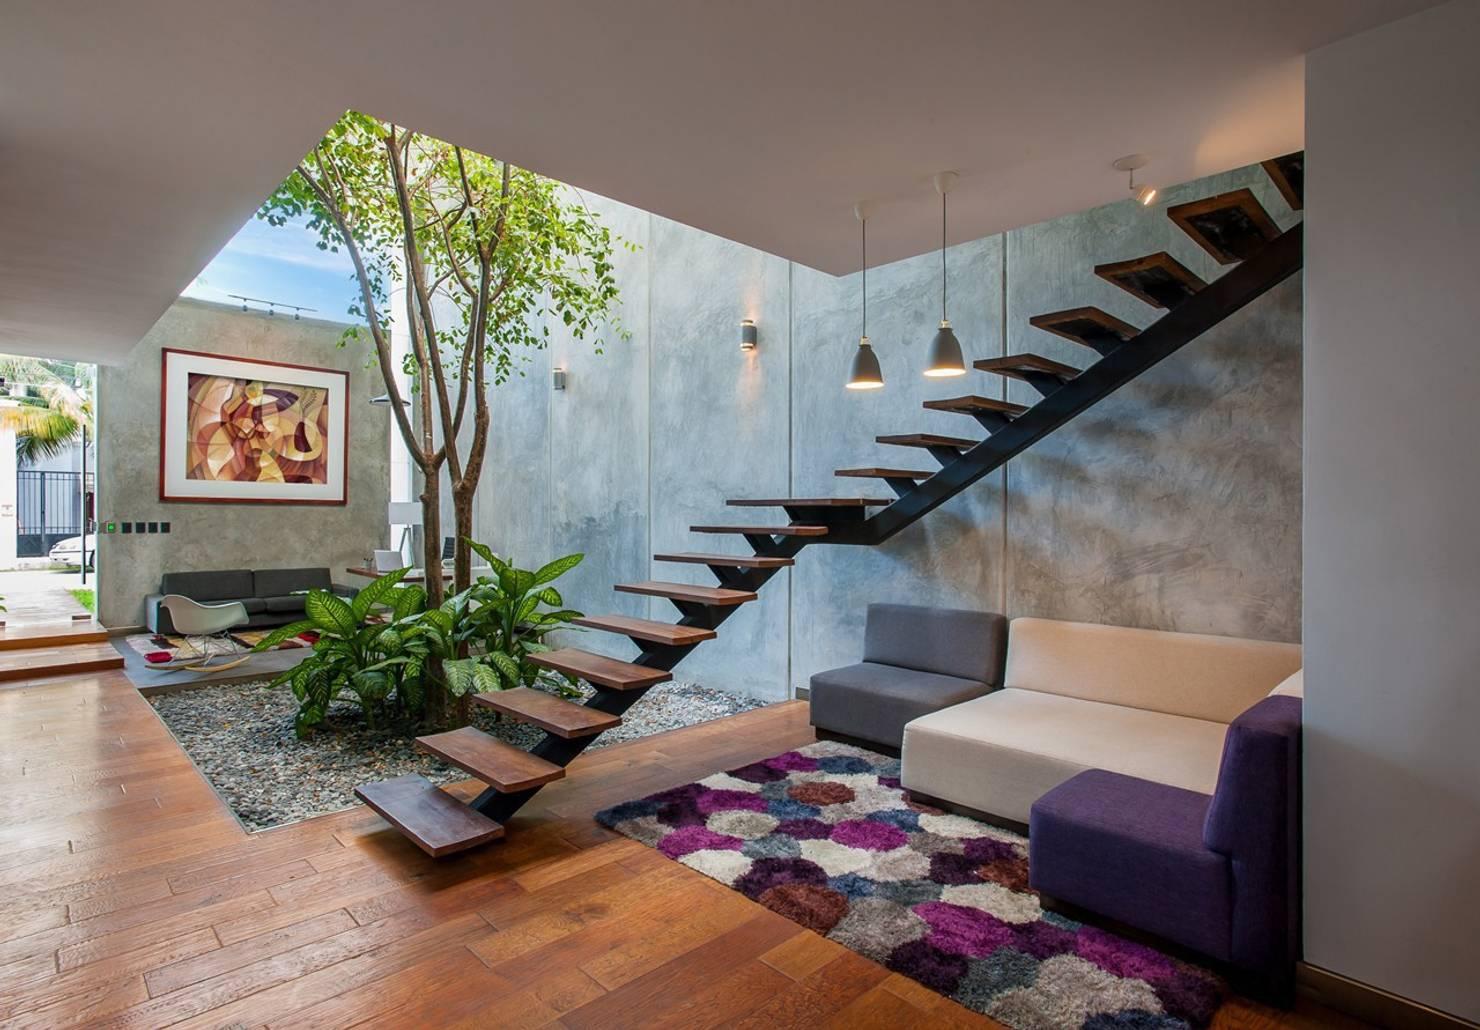 7 fantastic ideas for your terrace